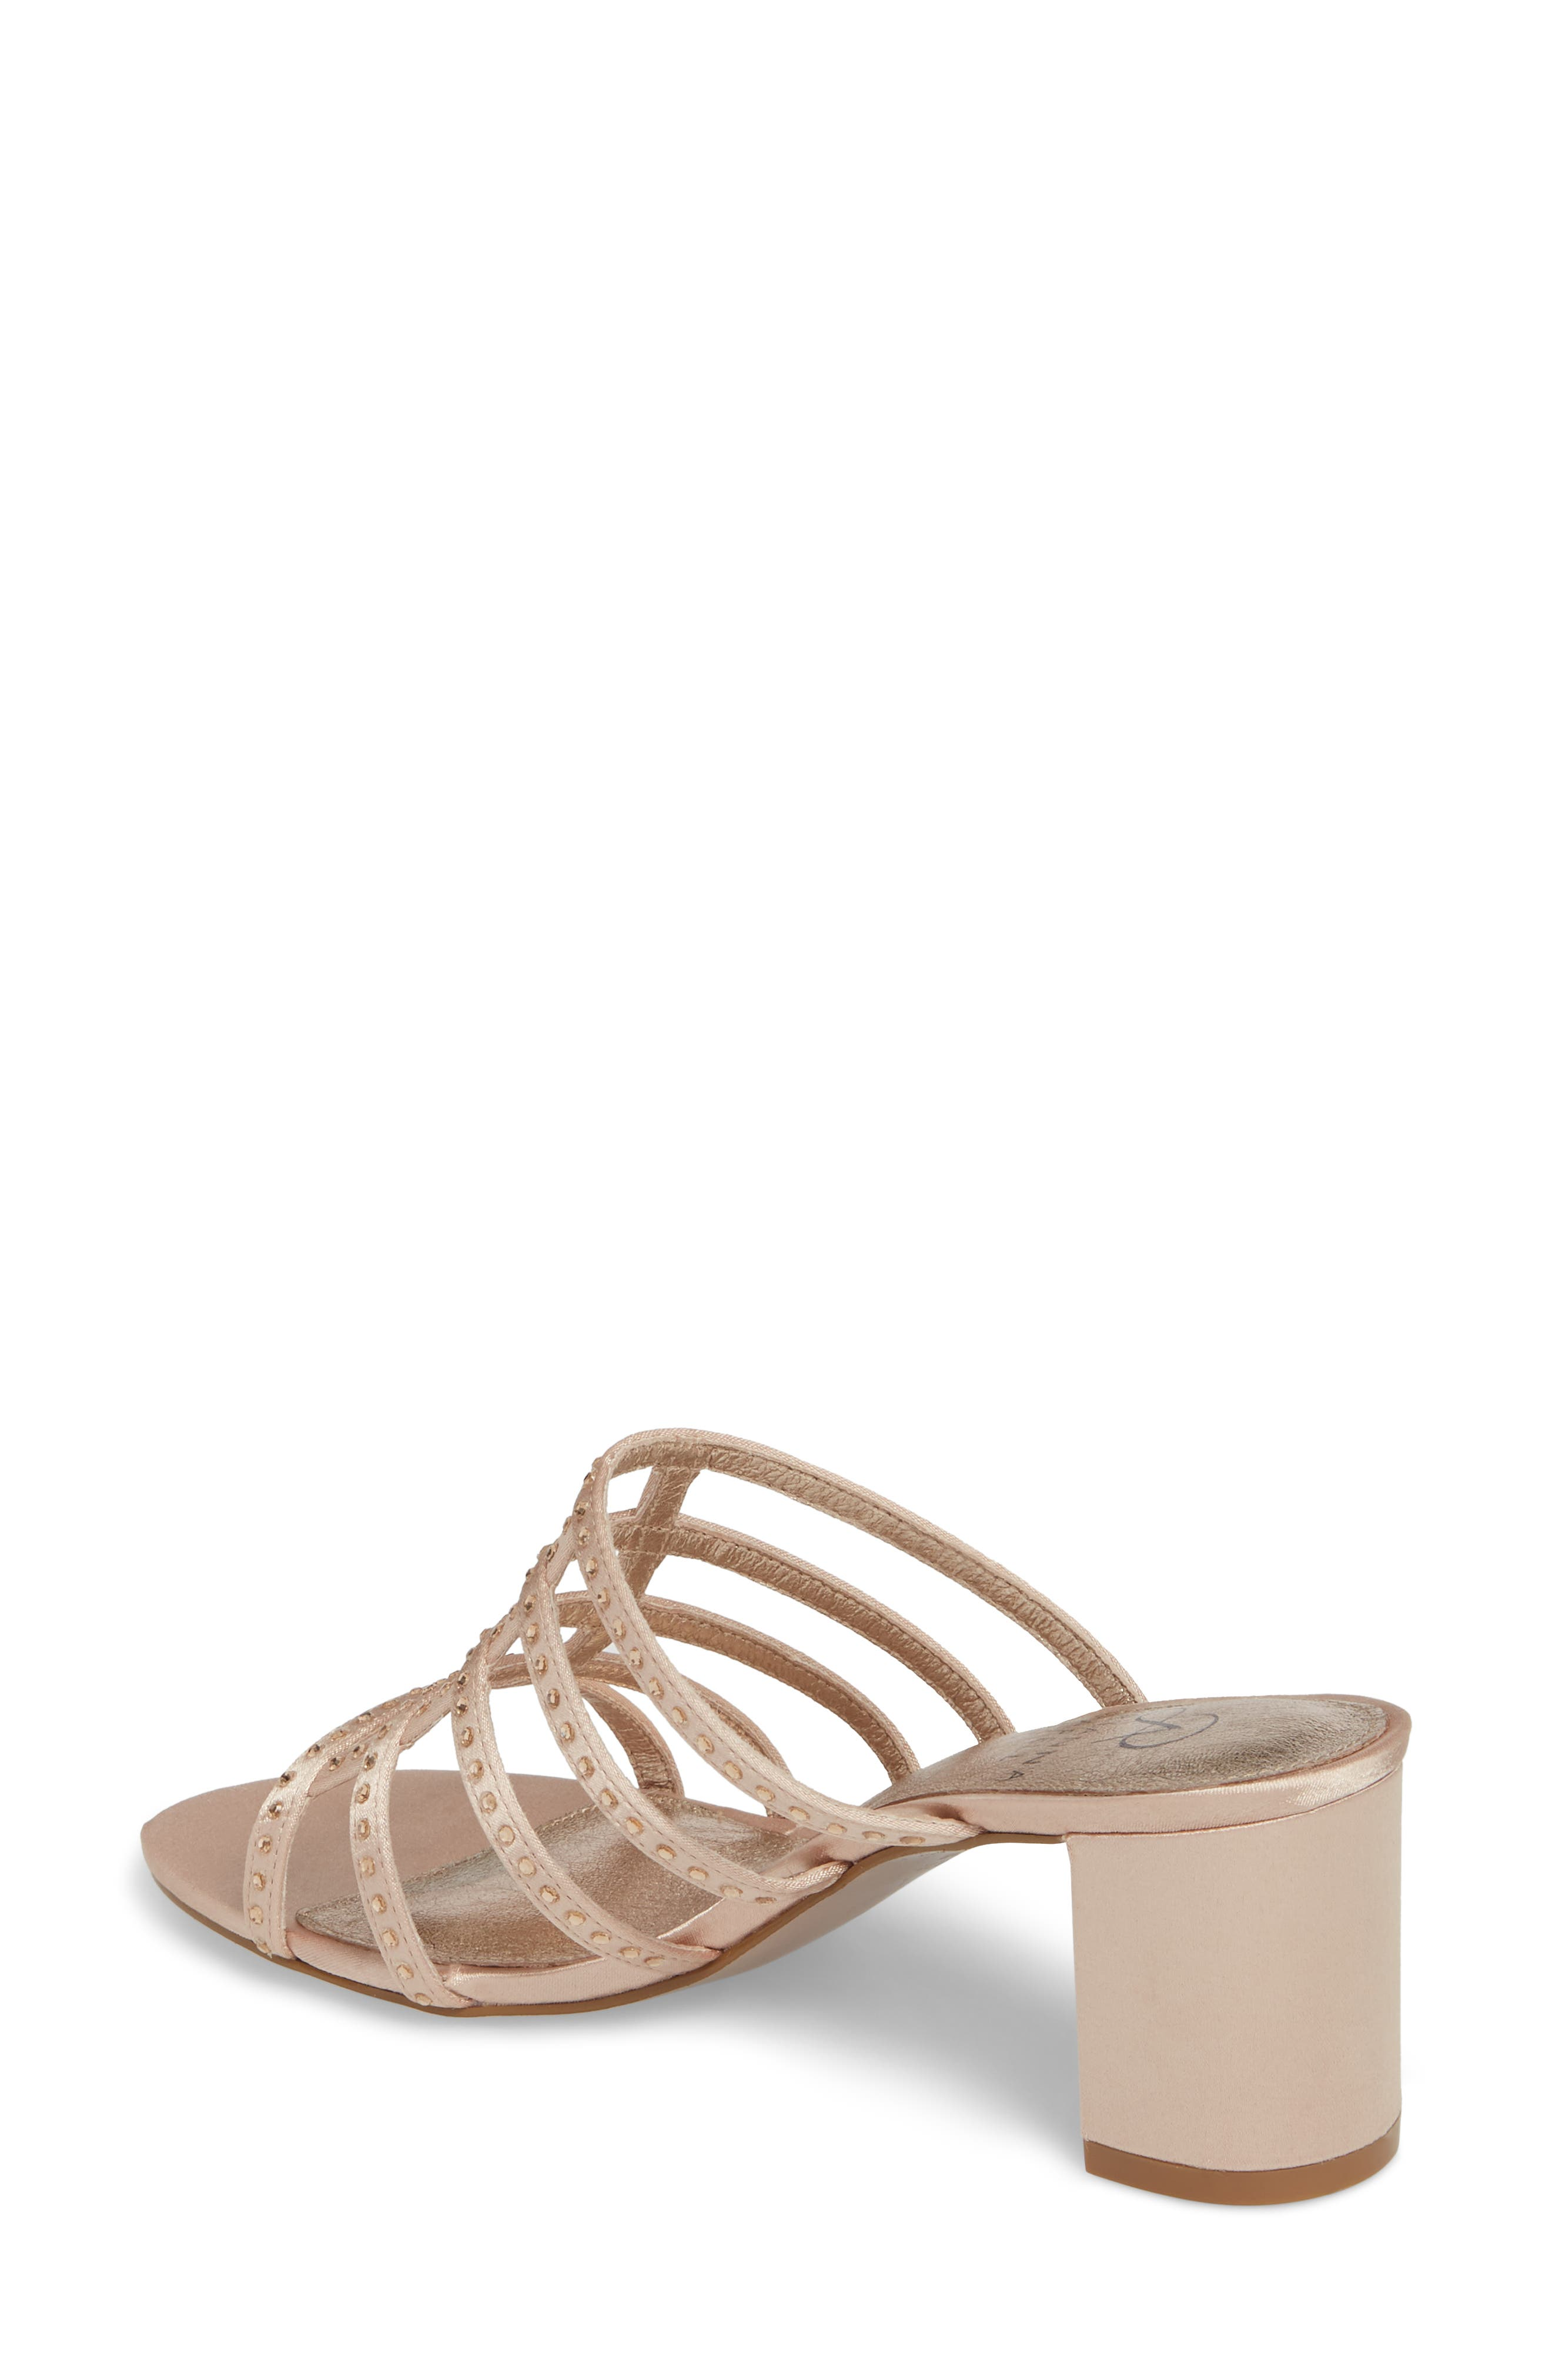 Apollo Block Heel Sandal,                             Alternate thumbnail 2, color,                             Sheer Fabric